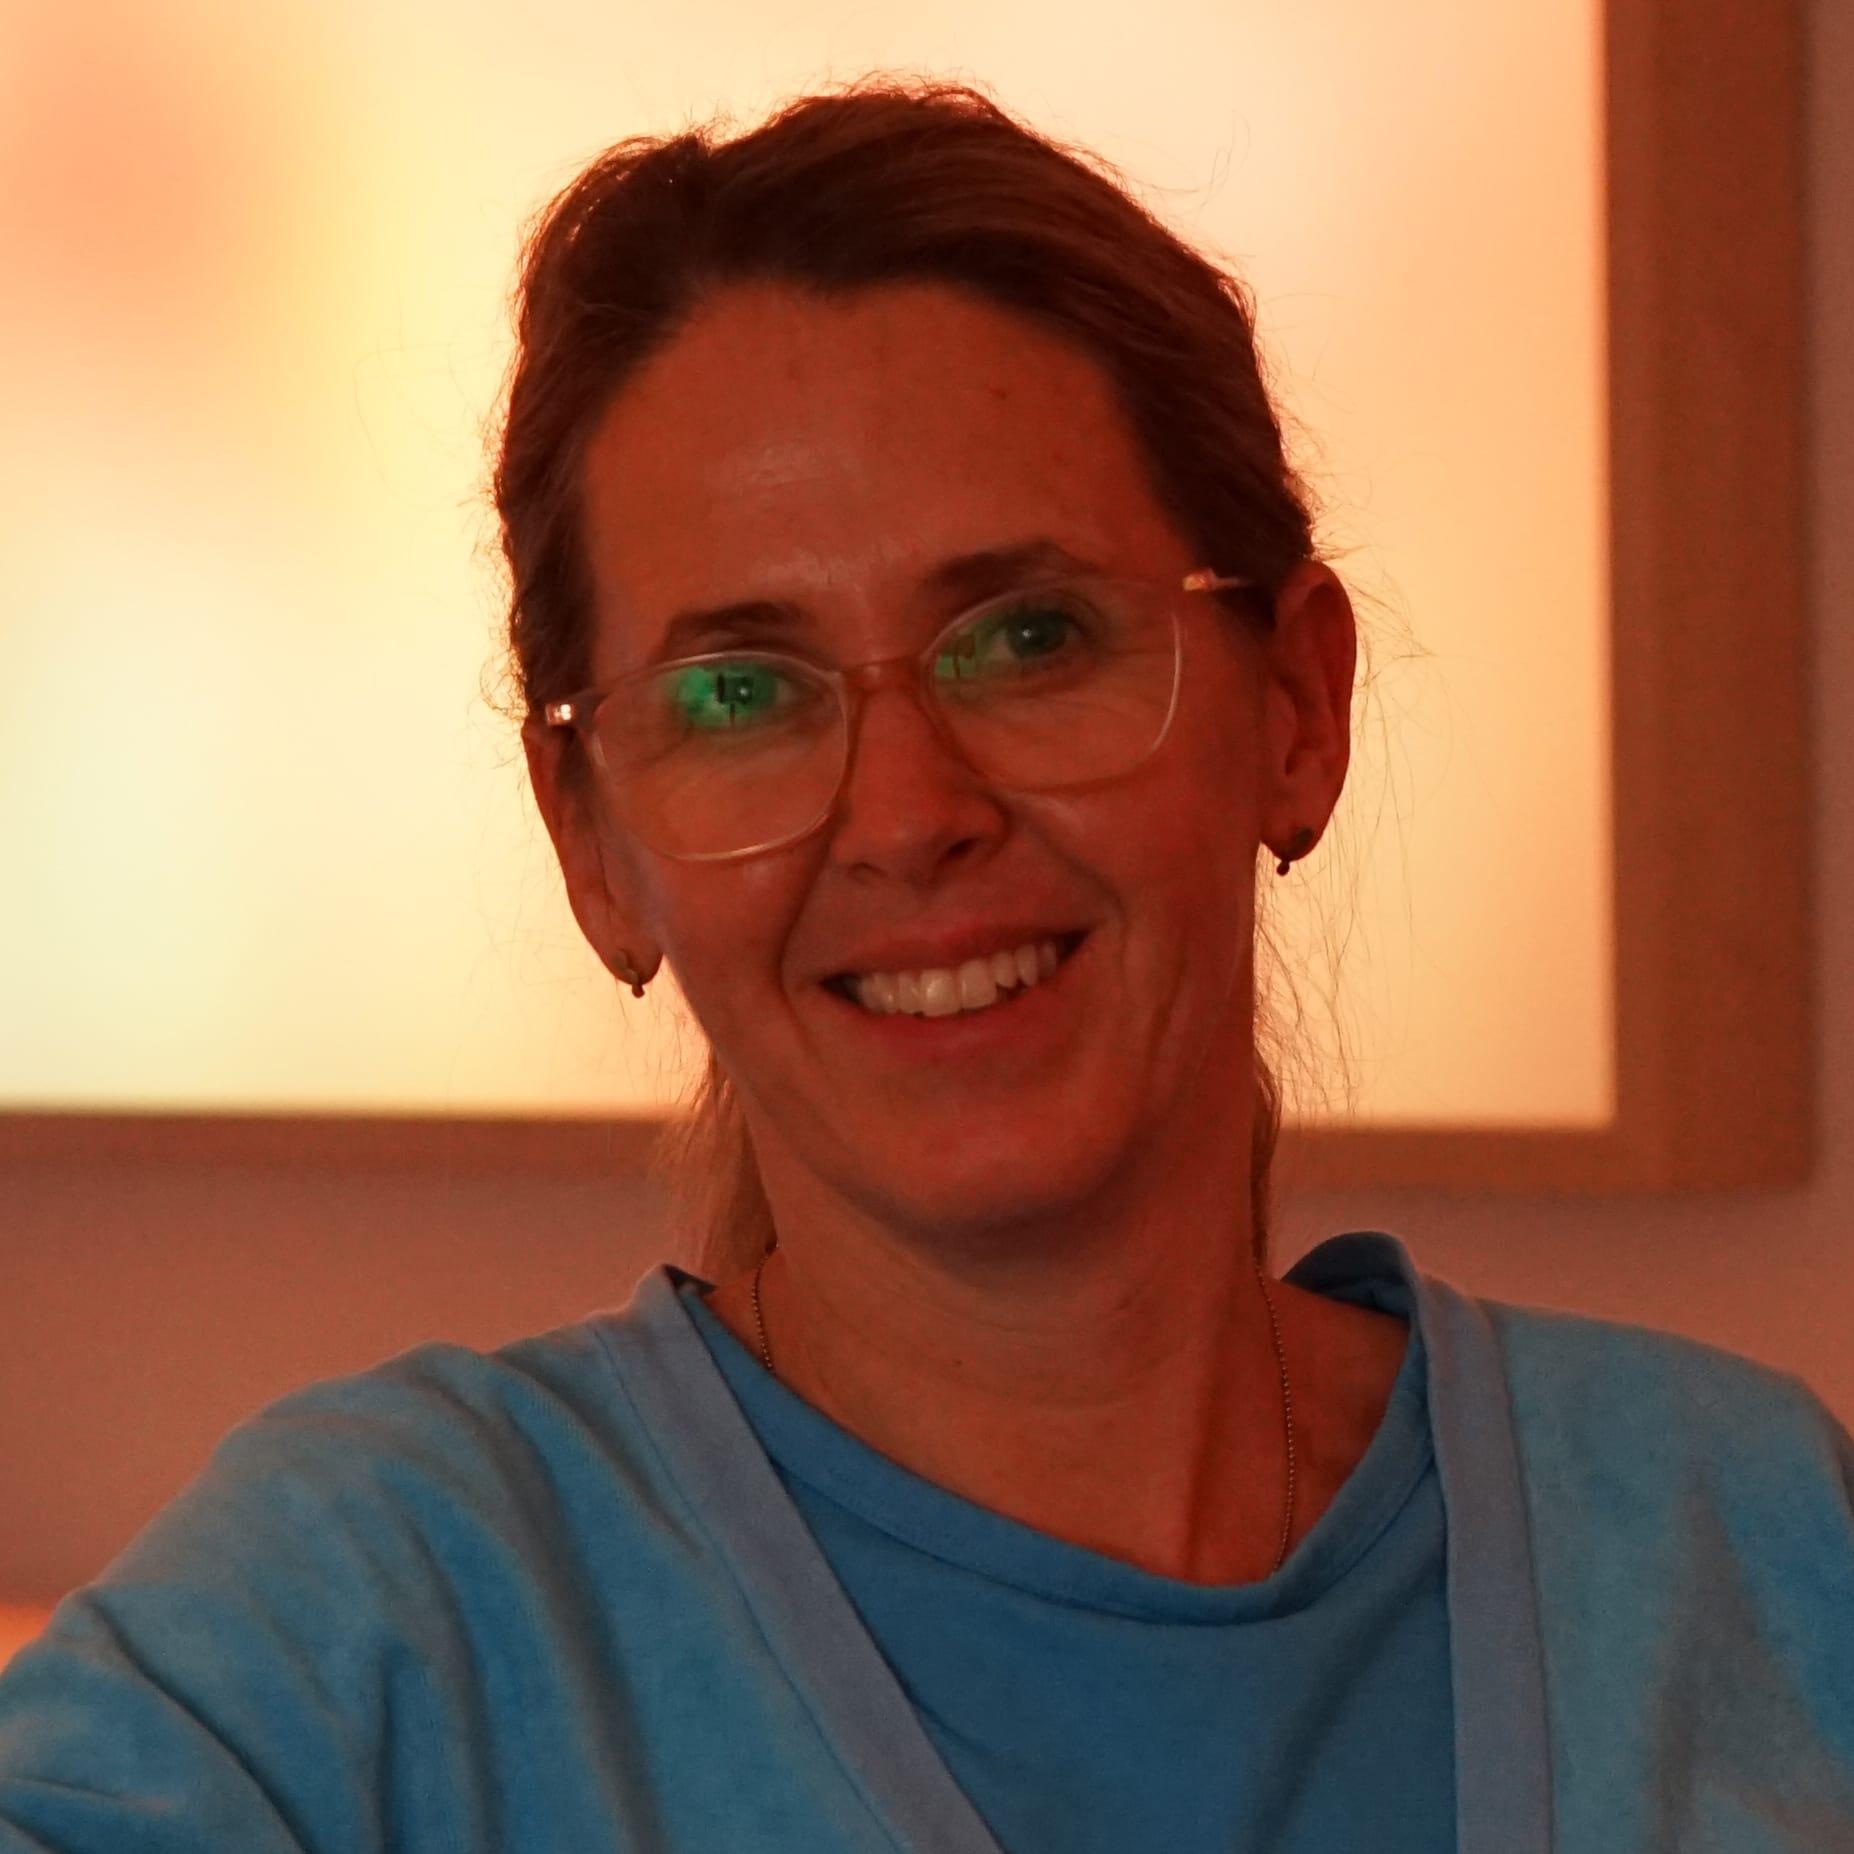 Maj-Britt Schulze Romme, Midwife